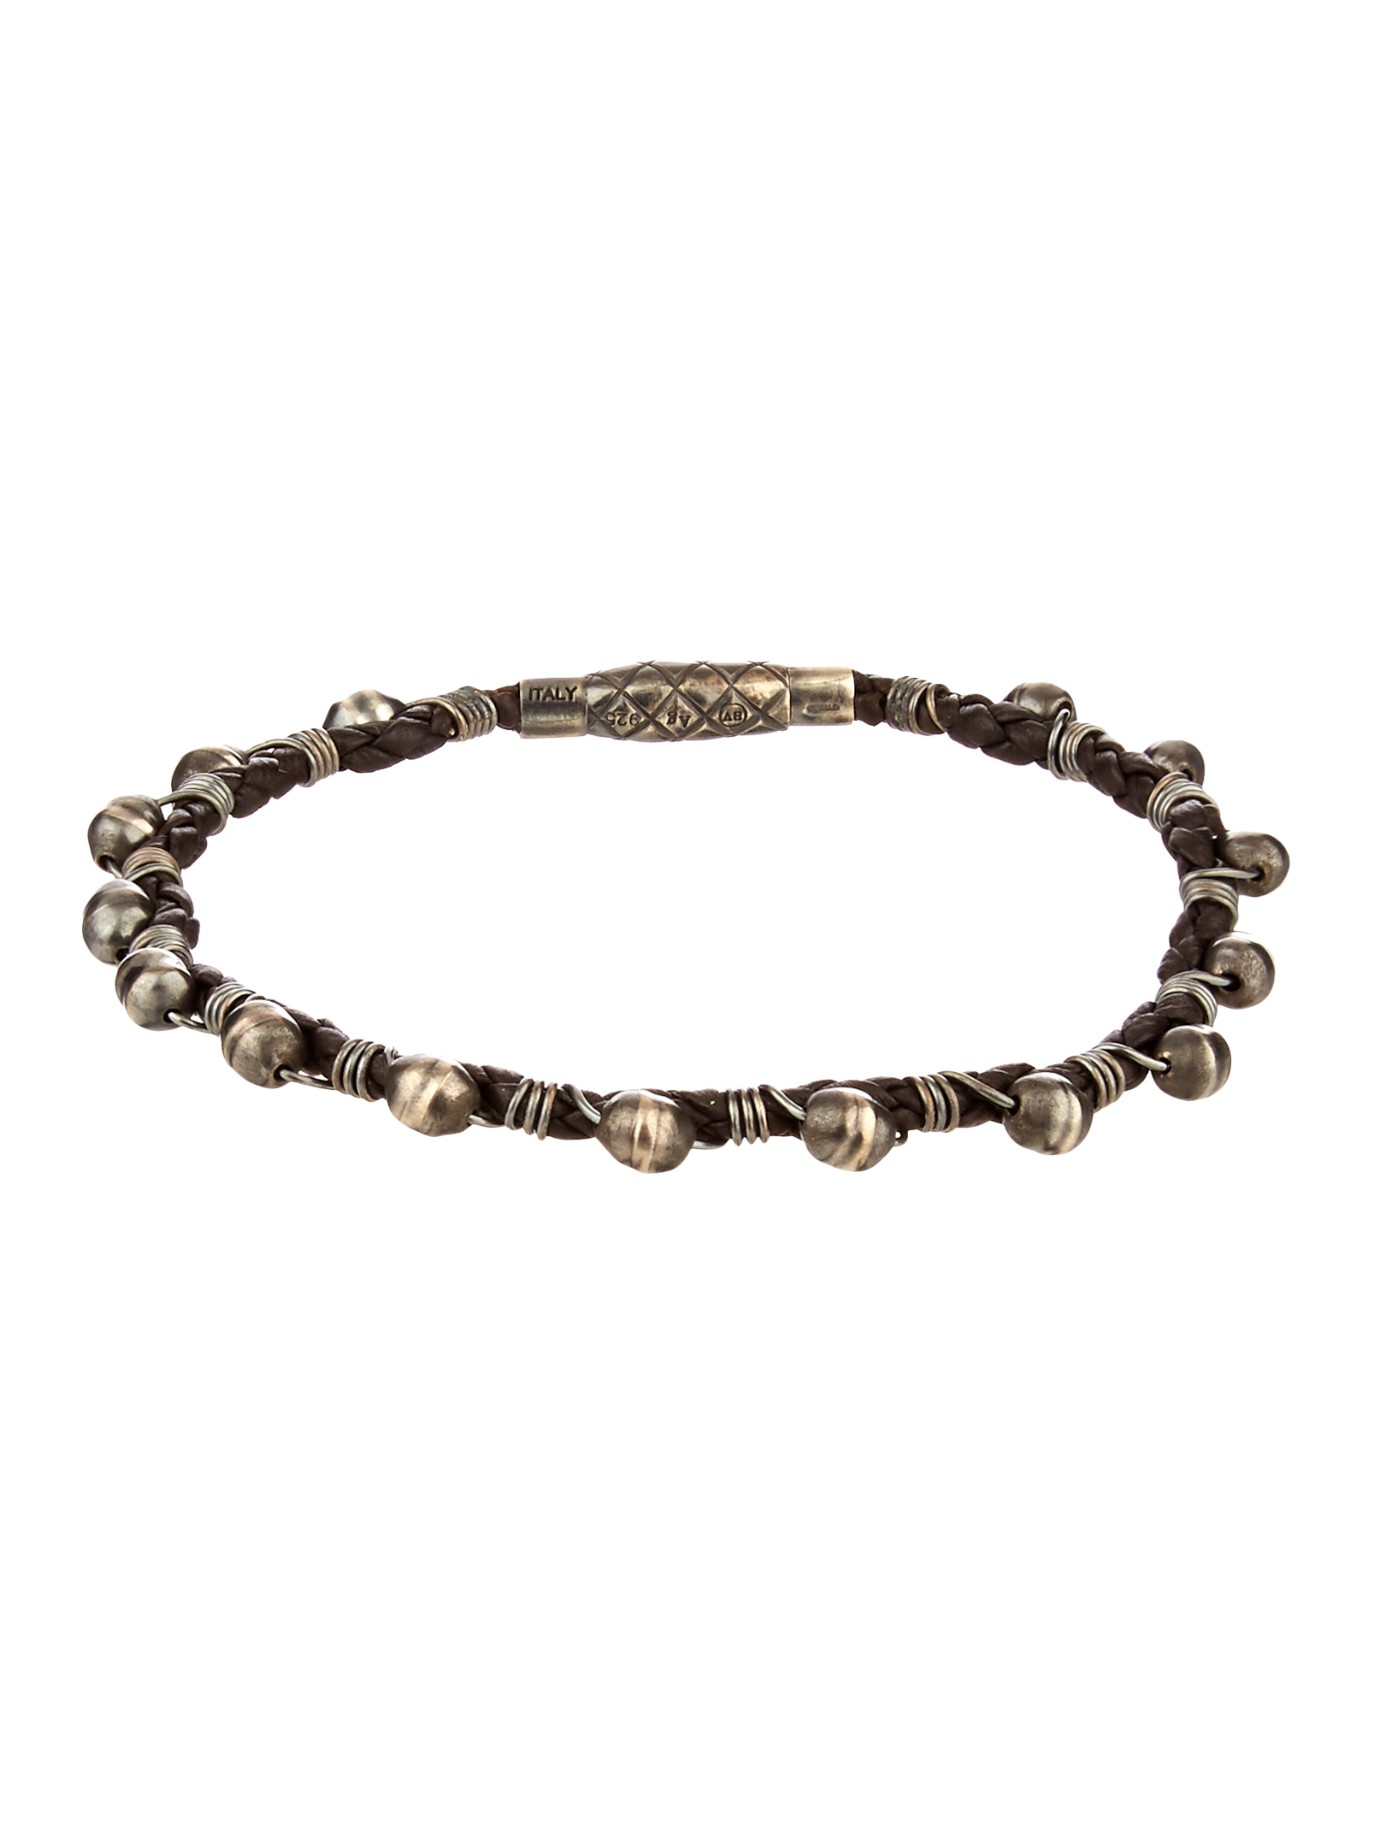 bottega veneta oxidised silver and woven leather bracelet